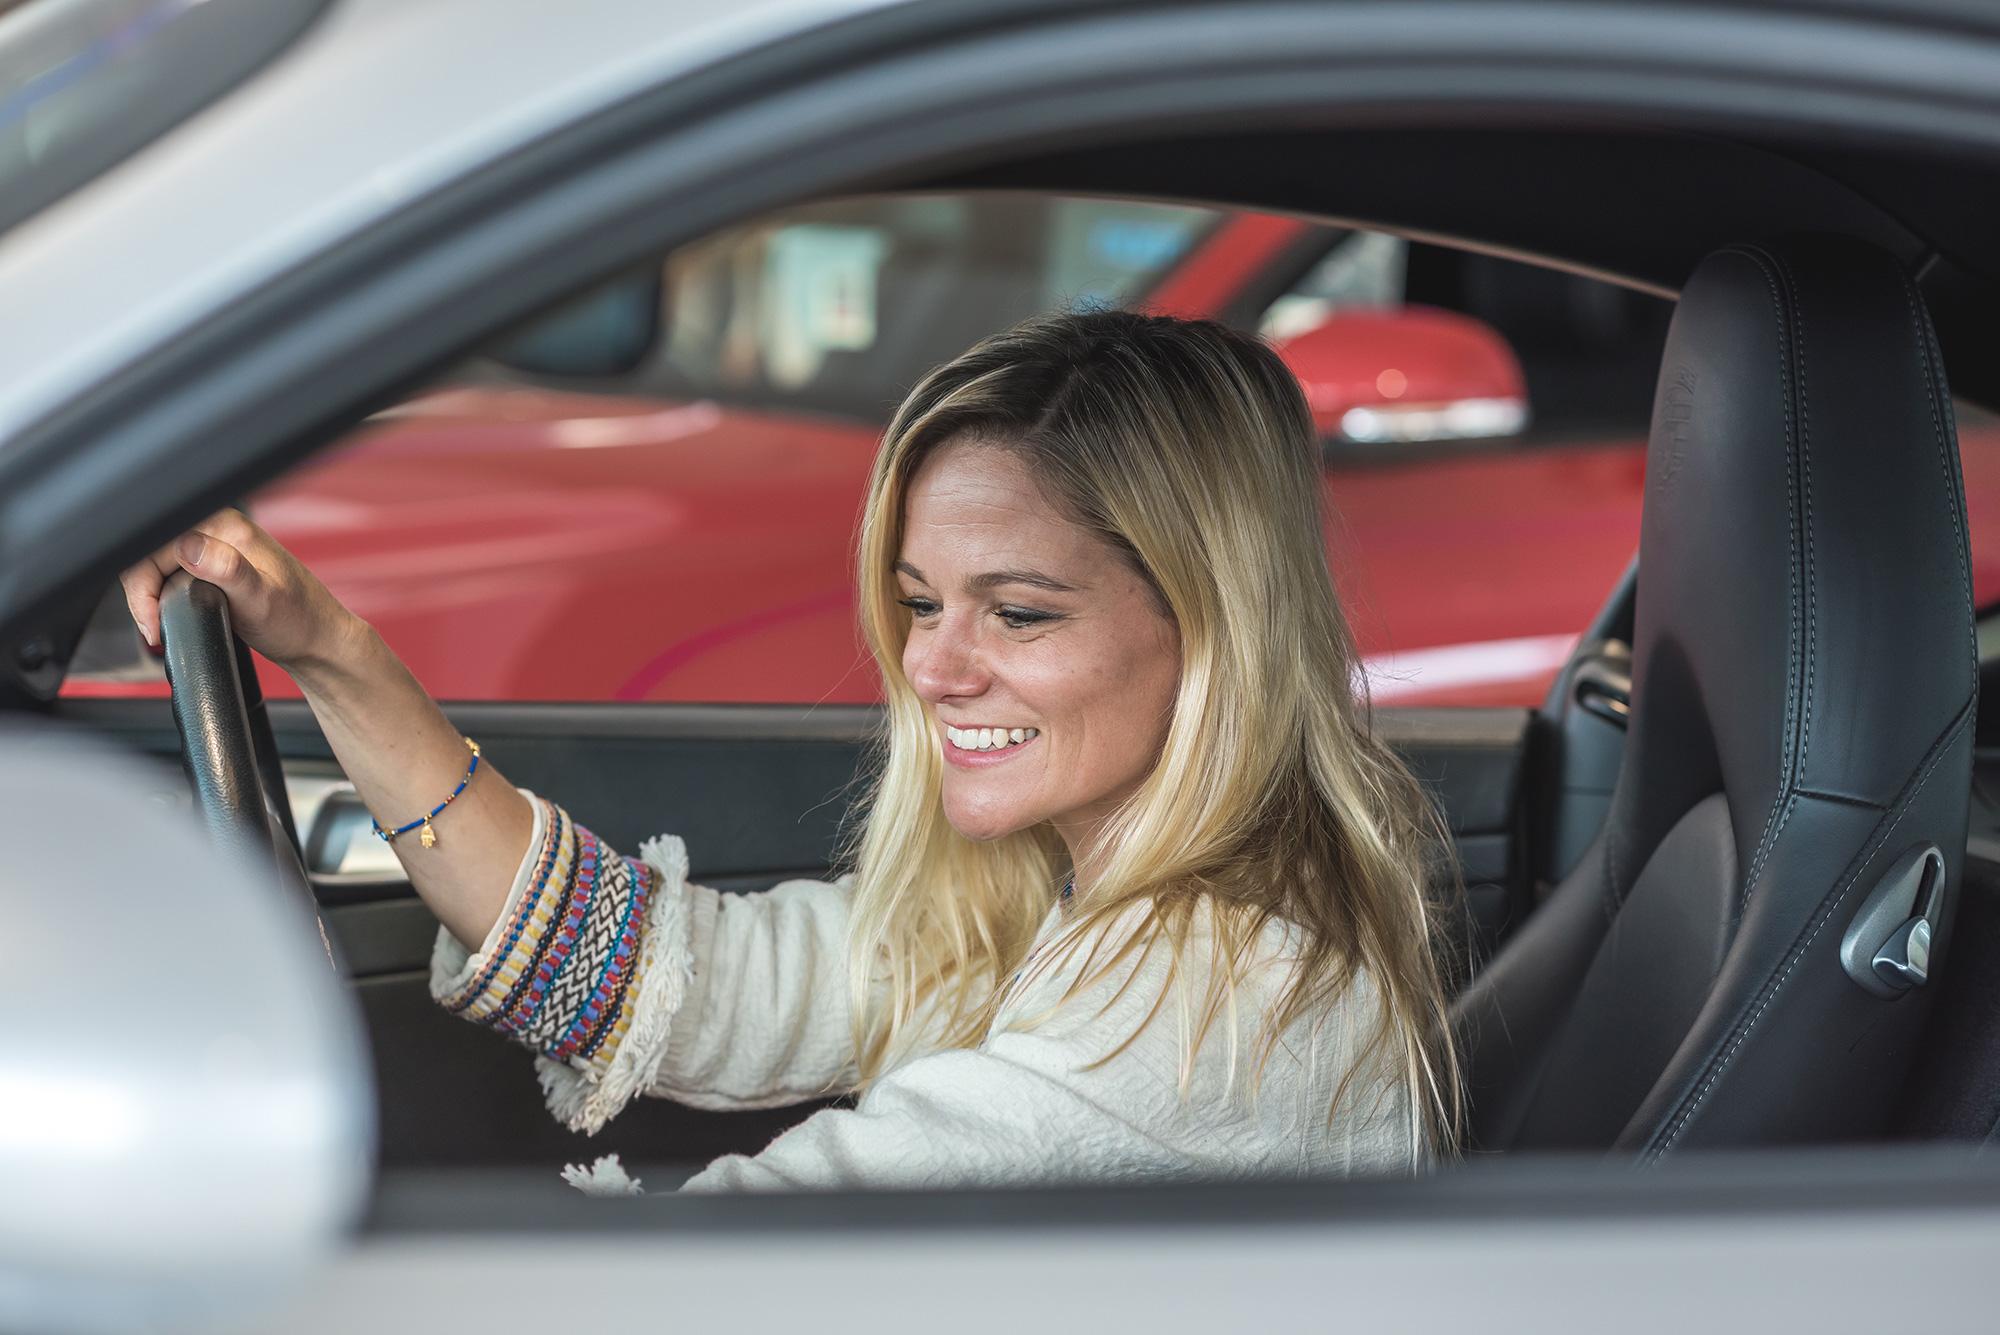 car-viewing-photography.jpg